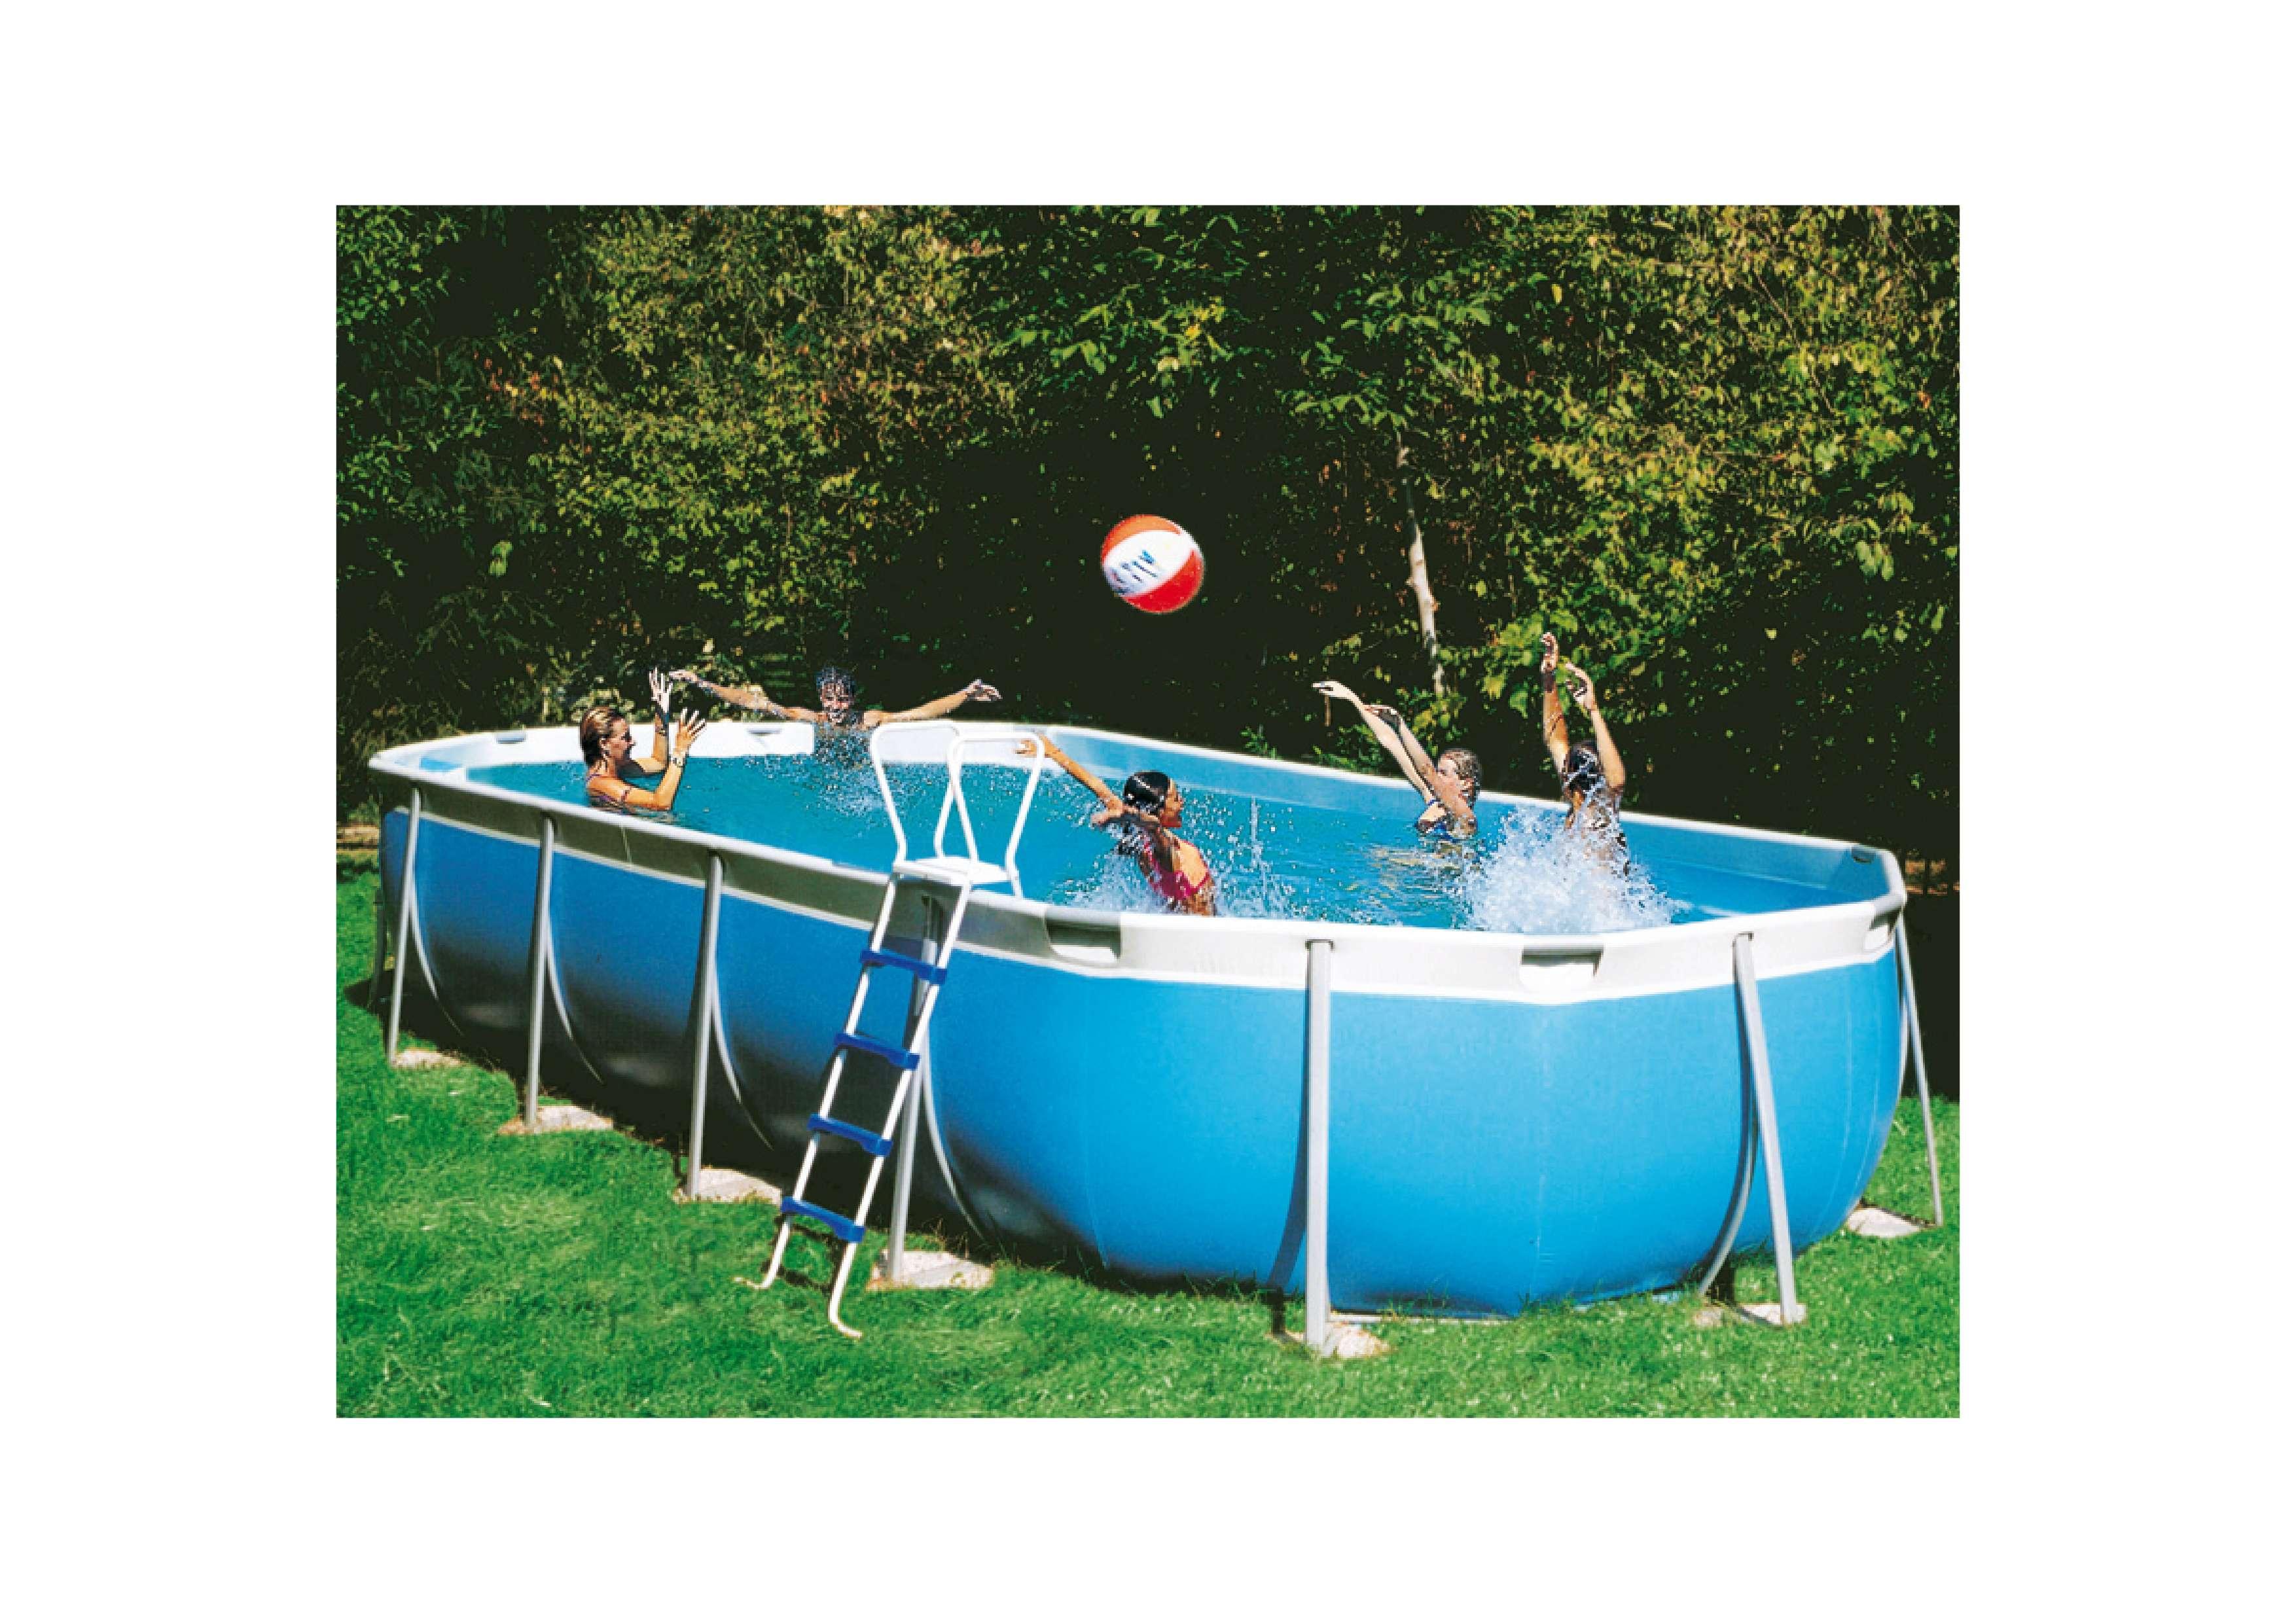 Absolut piscine fuori terra autoportanti - Piscine fuori terra autoportanti ...